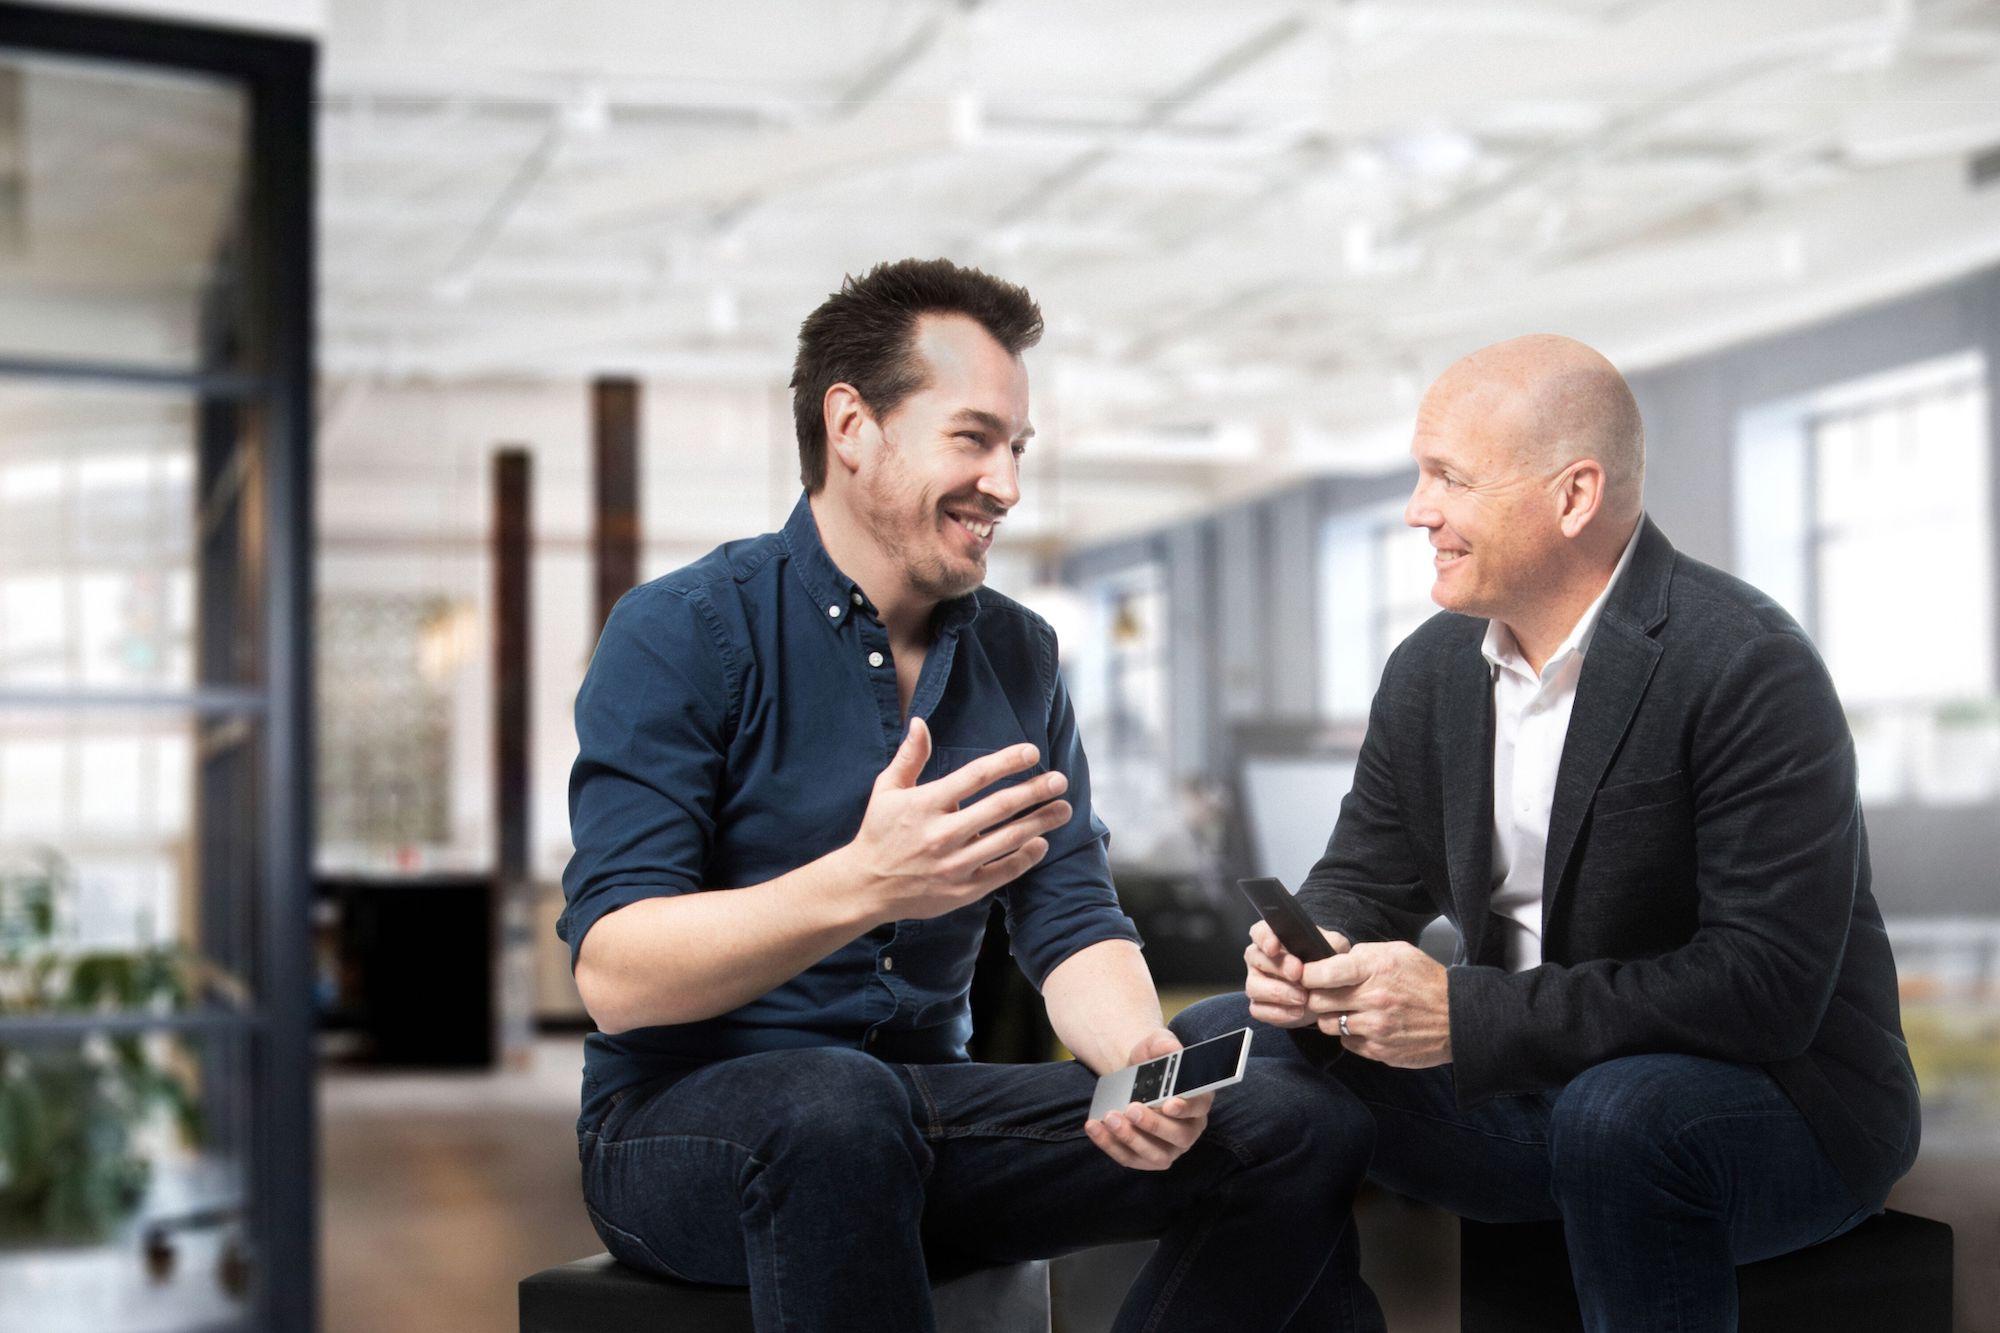 Raphael Oberholzer and Charlie Kindel sitting and talking